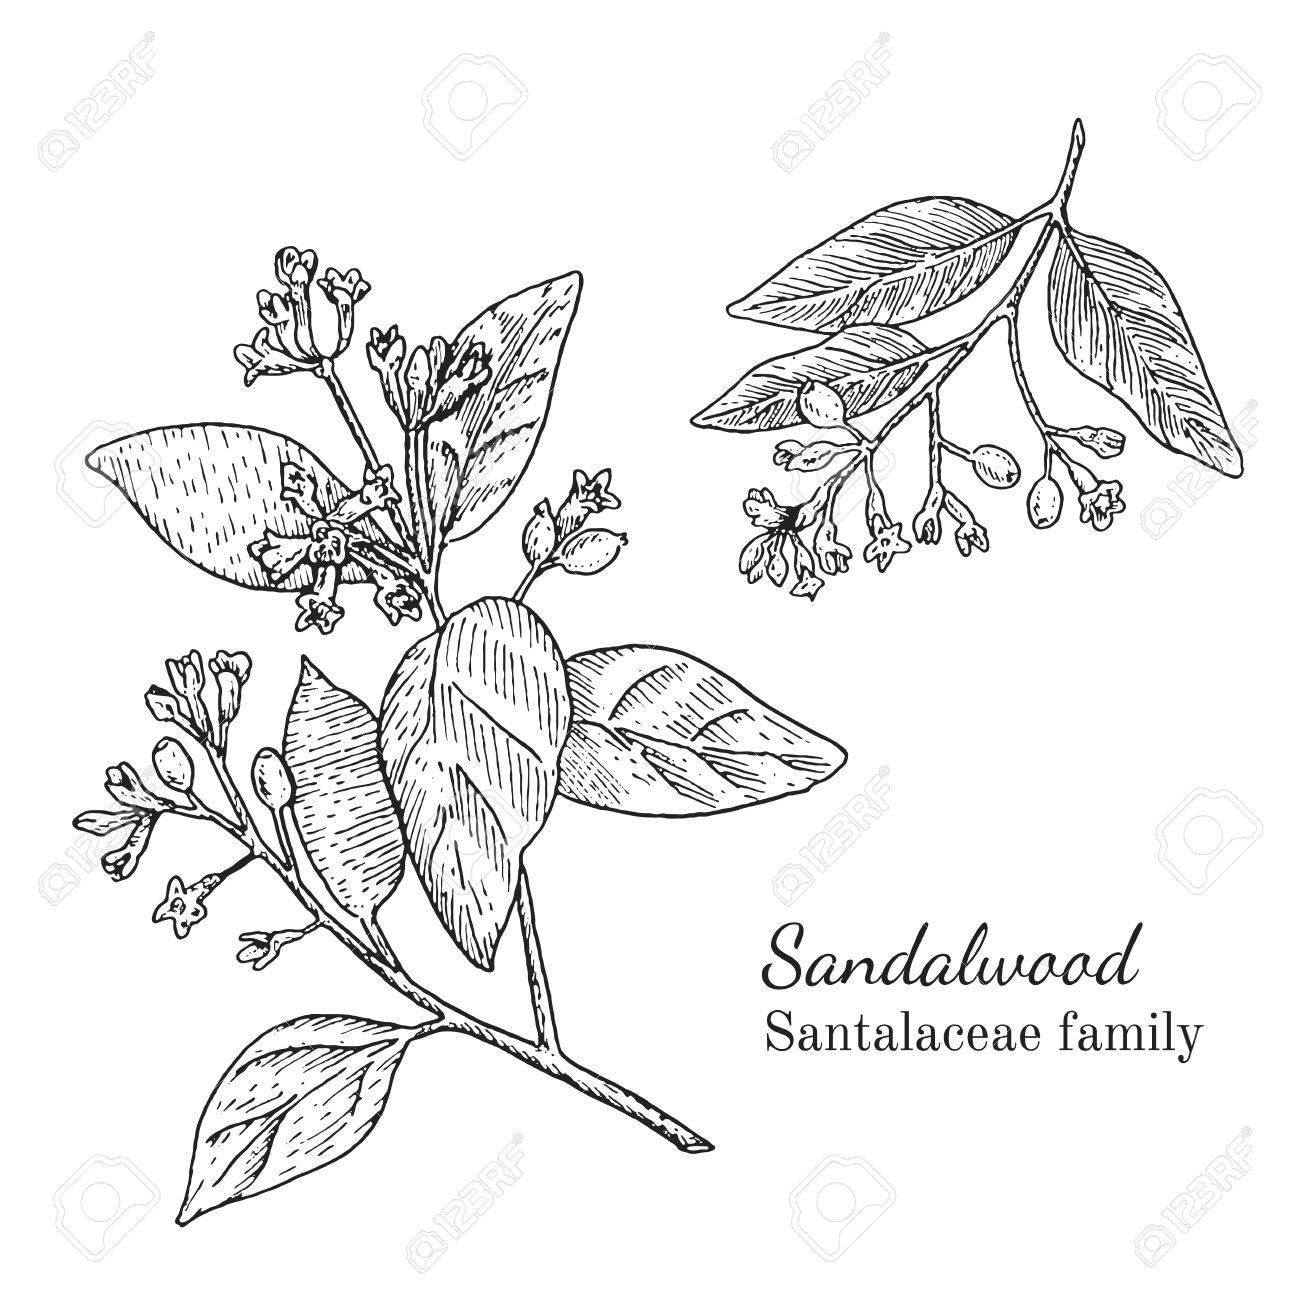 1300x1300 Ink Sandalwood Herbal Illustration. Hand Drawn Botanical Sketch